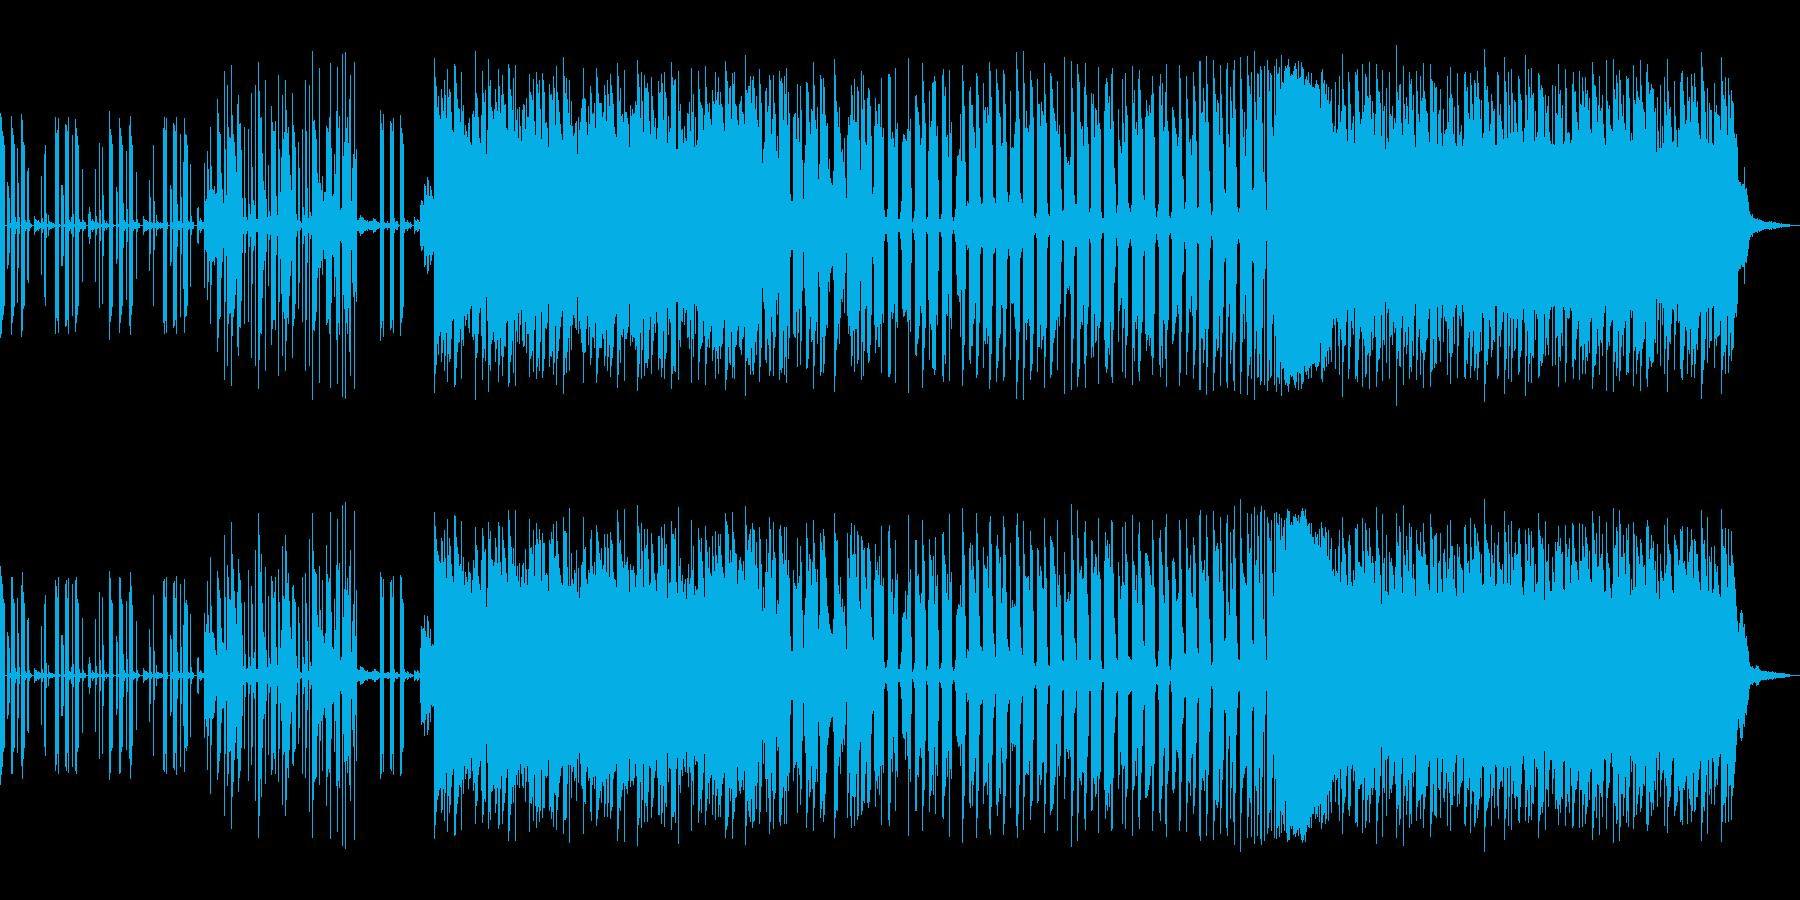 EDM調にコミカルさを足した感じです。の再生済みの波形